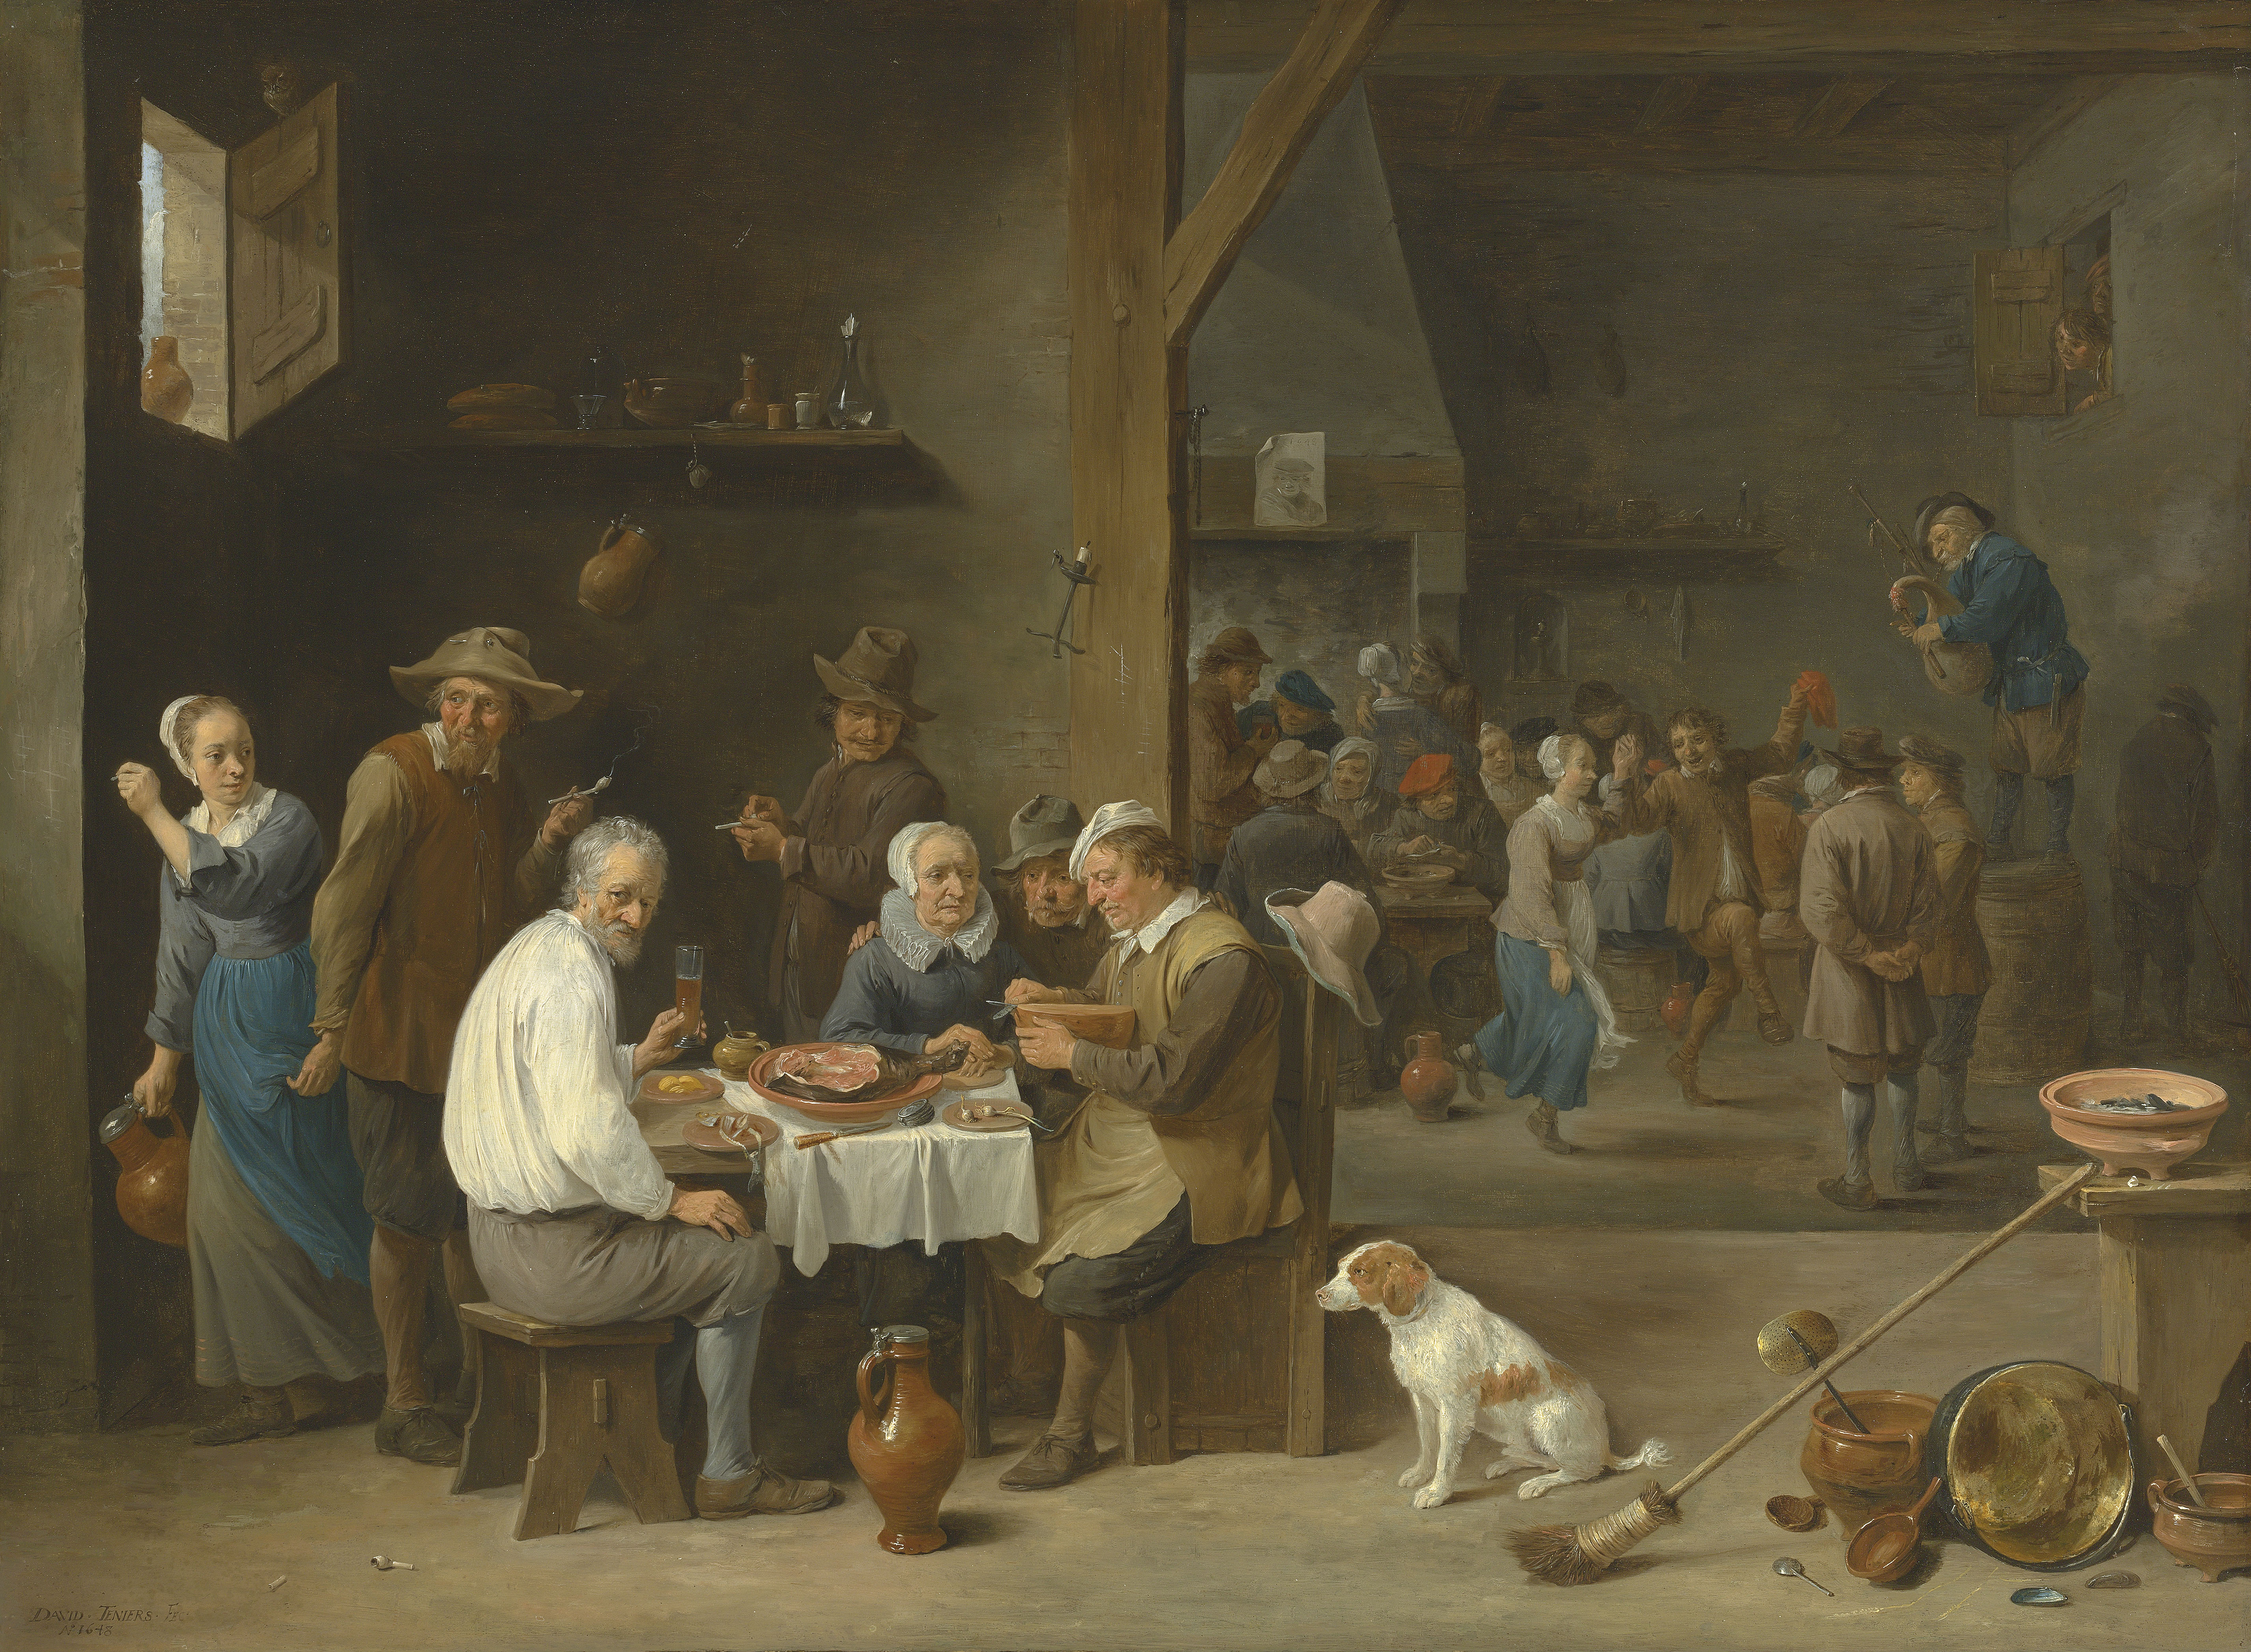 David Teniers, the Younger  (Antwerp 1610-1690 Brussels)